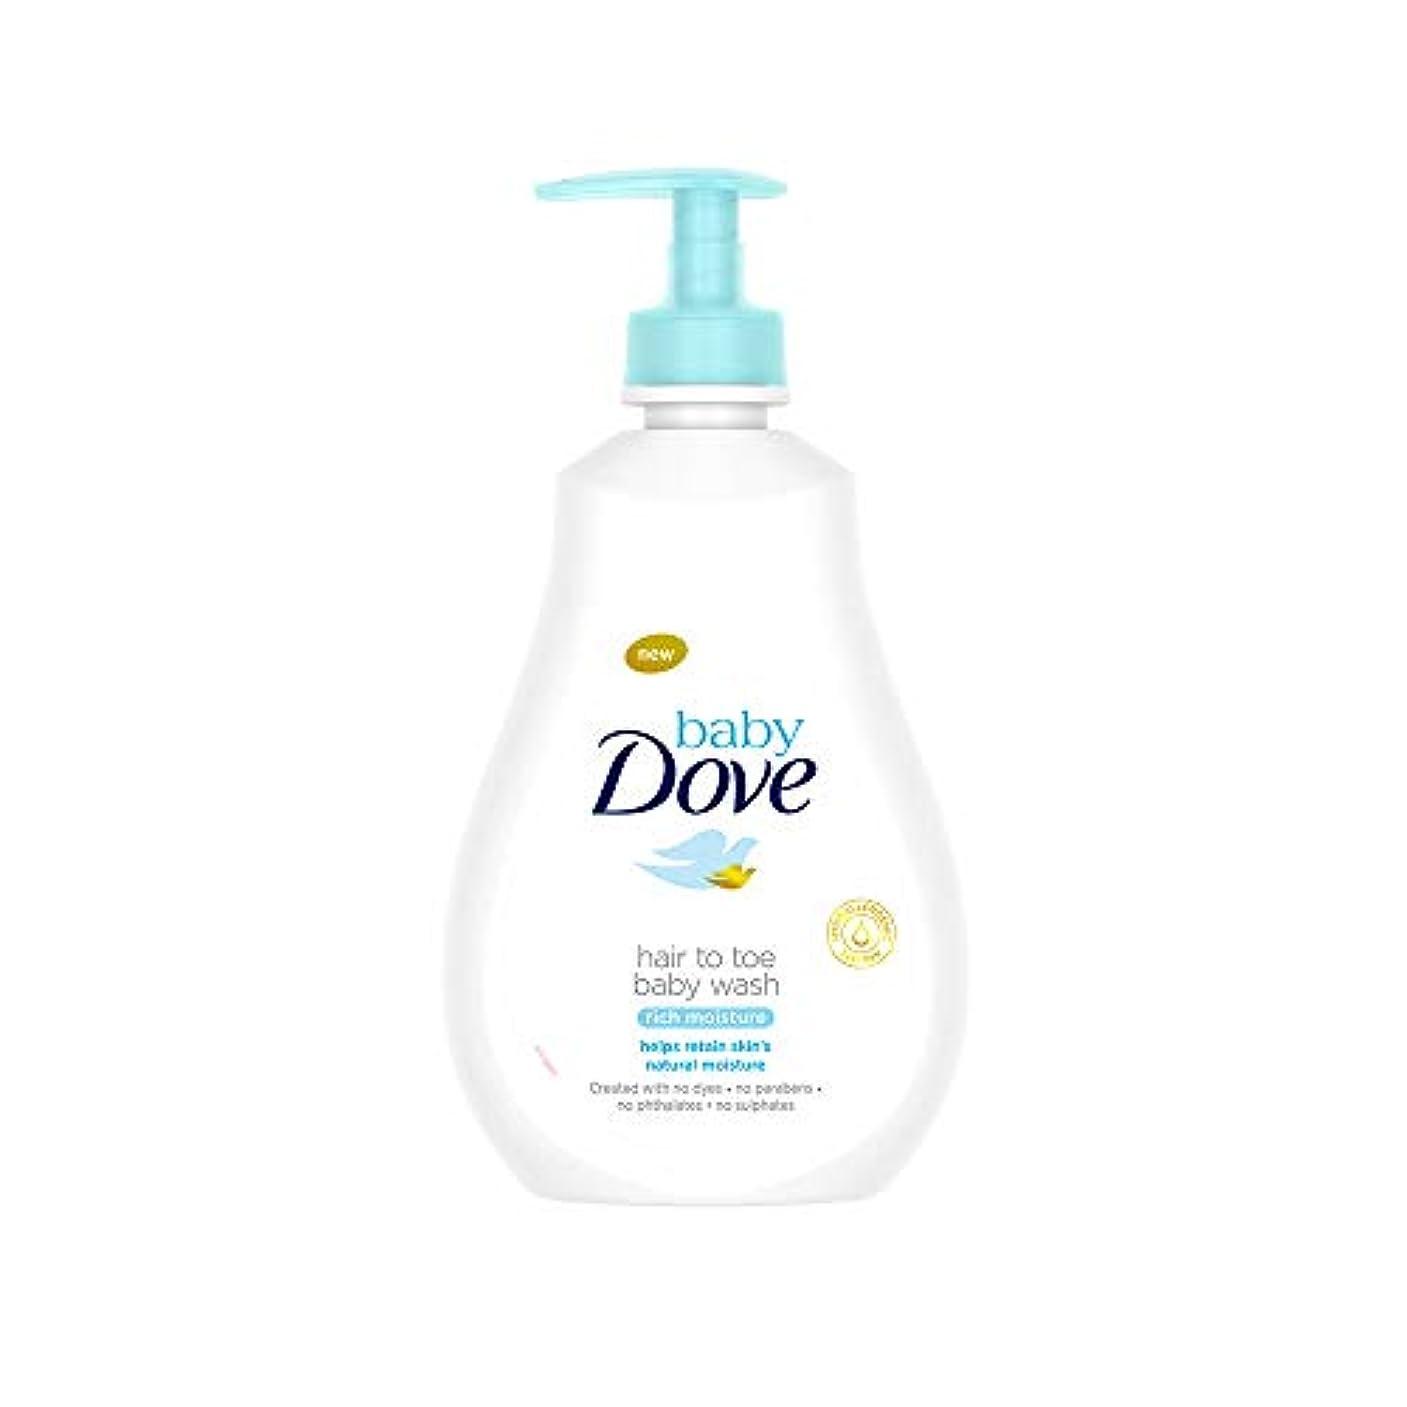 Baby Dove Rich Moisture Hair to Toe Baby Wash, 400 ml